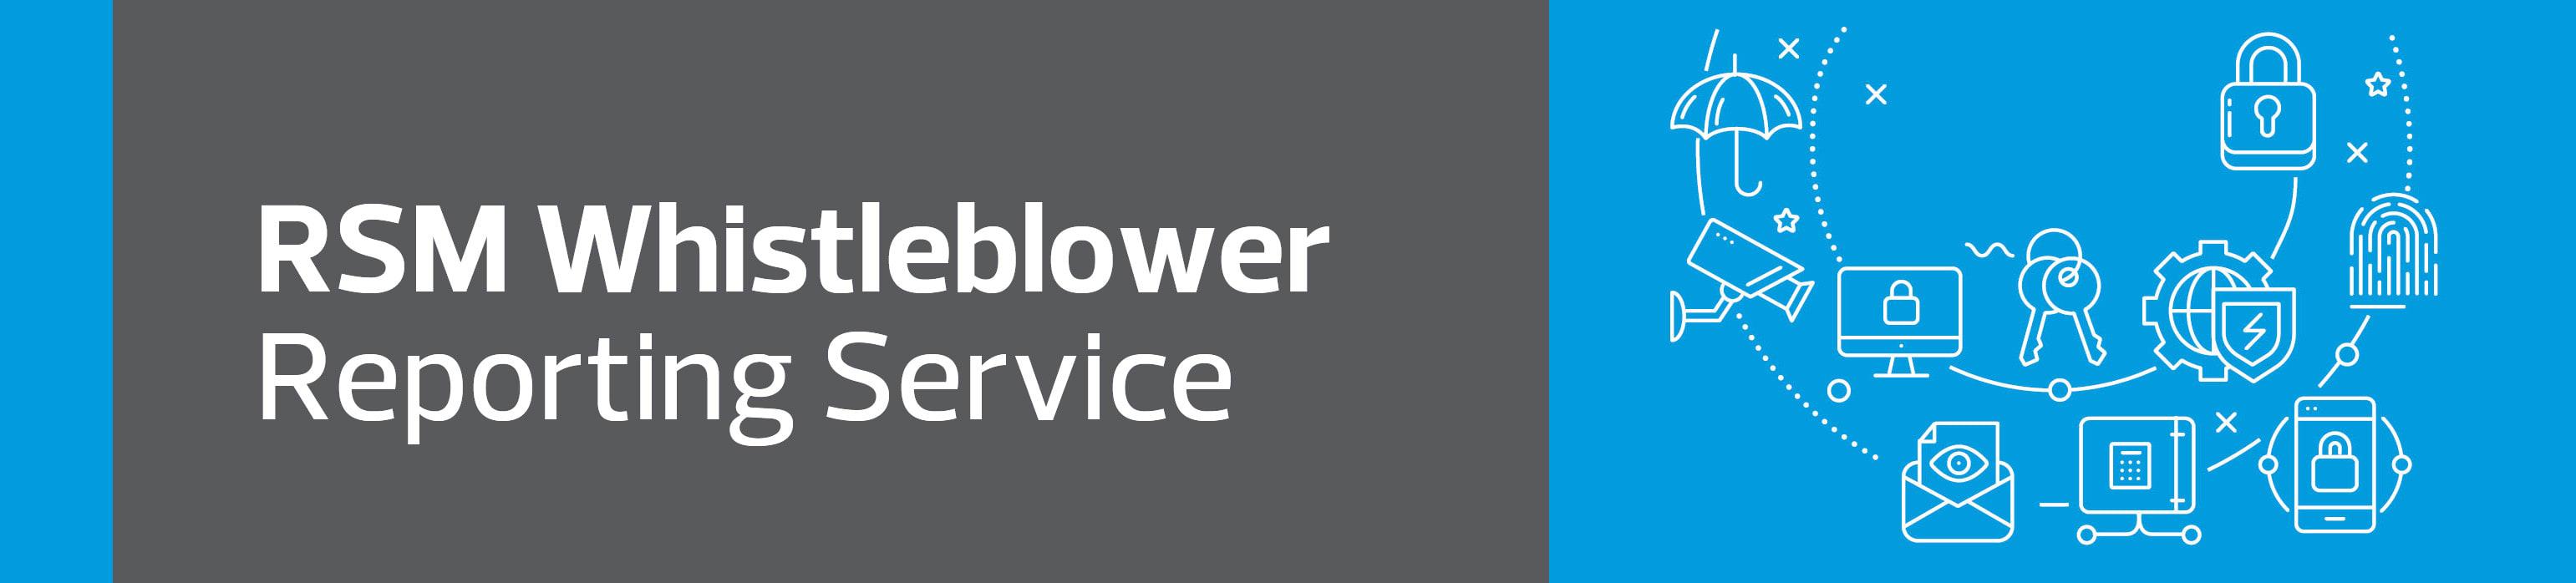 RSM Whistleblower reporting service